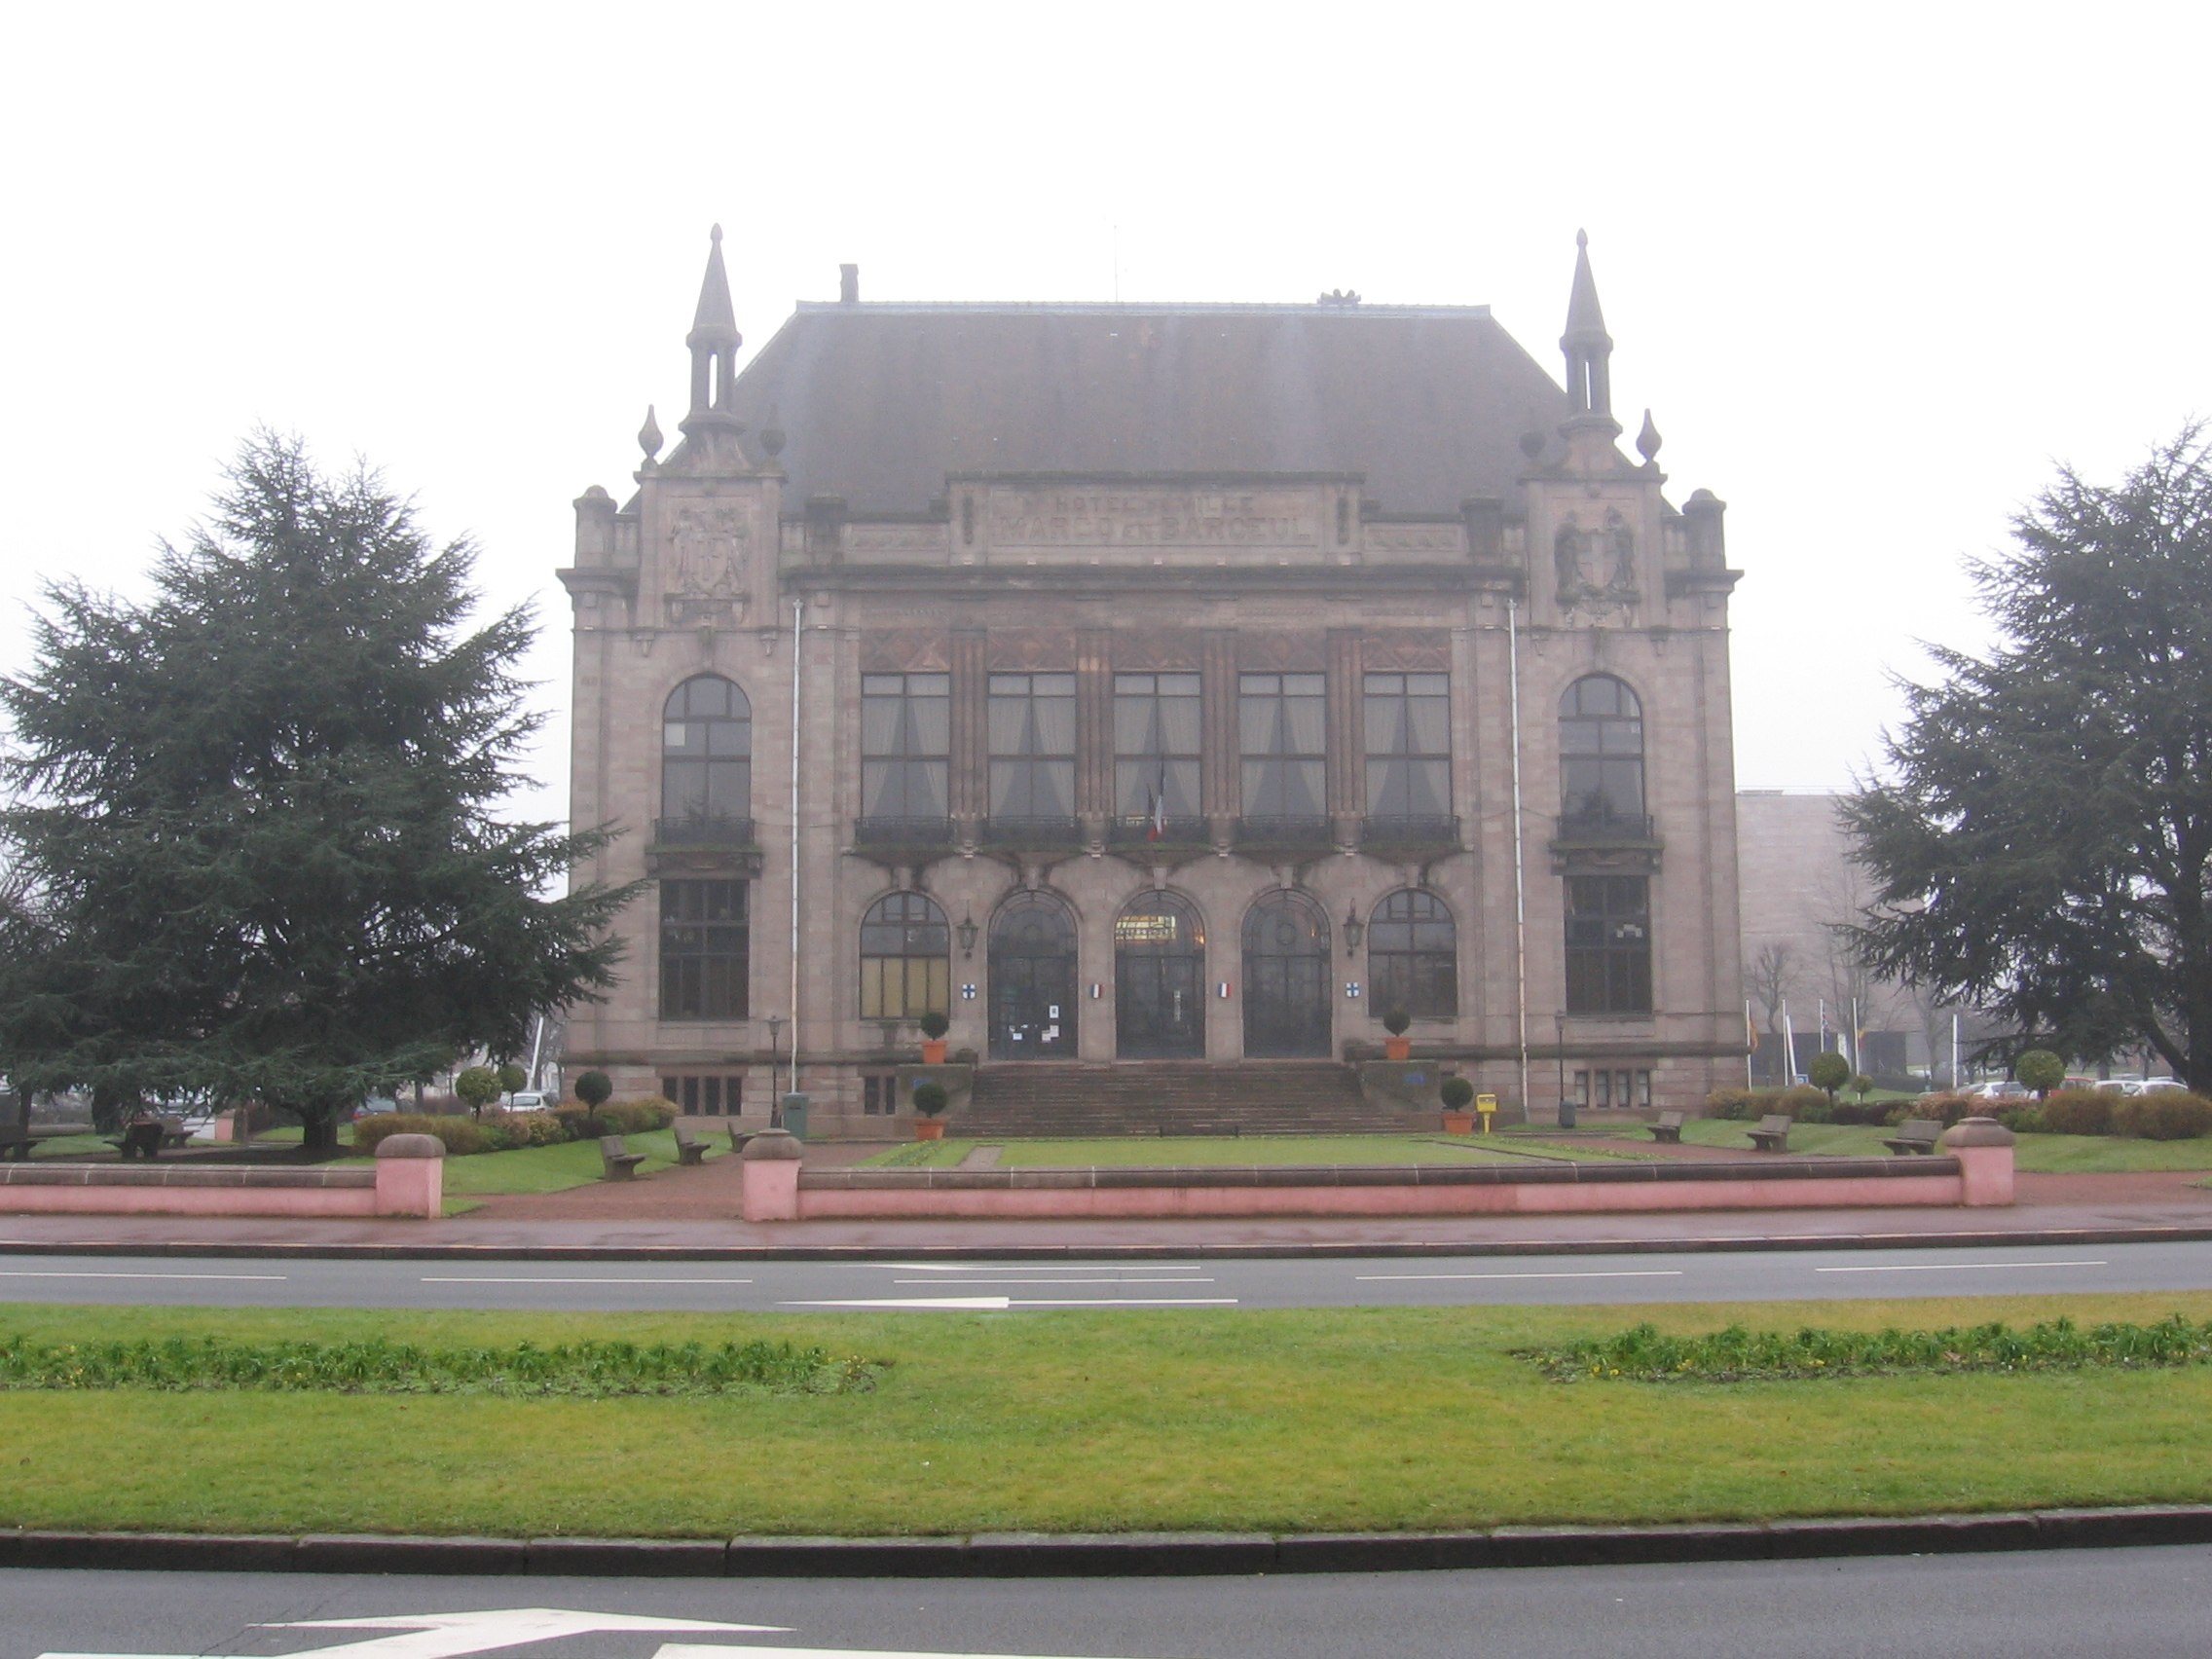 Mairie_de_Marcq-en-Baroeul_0673